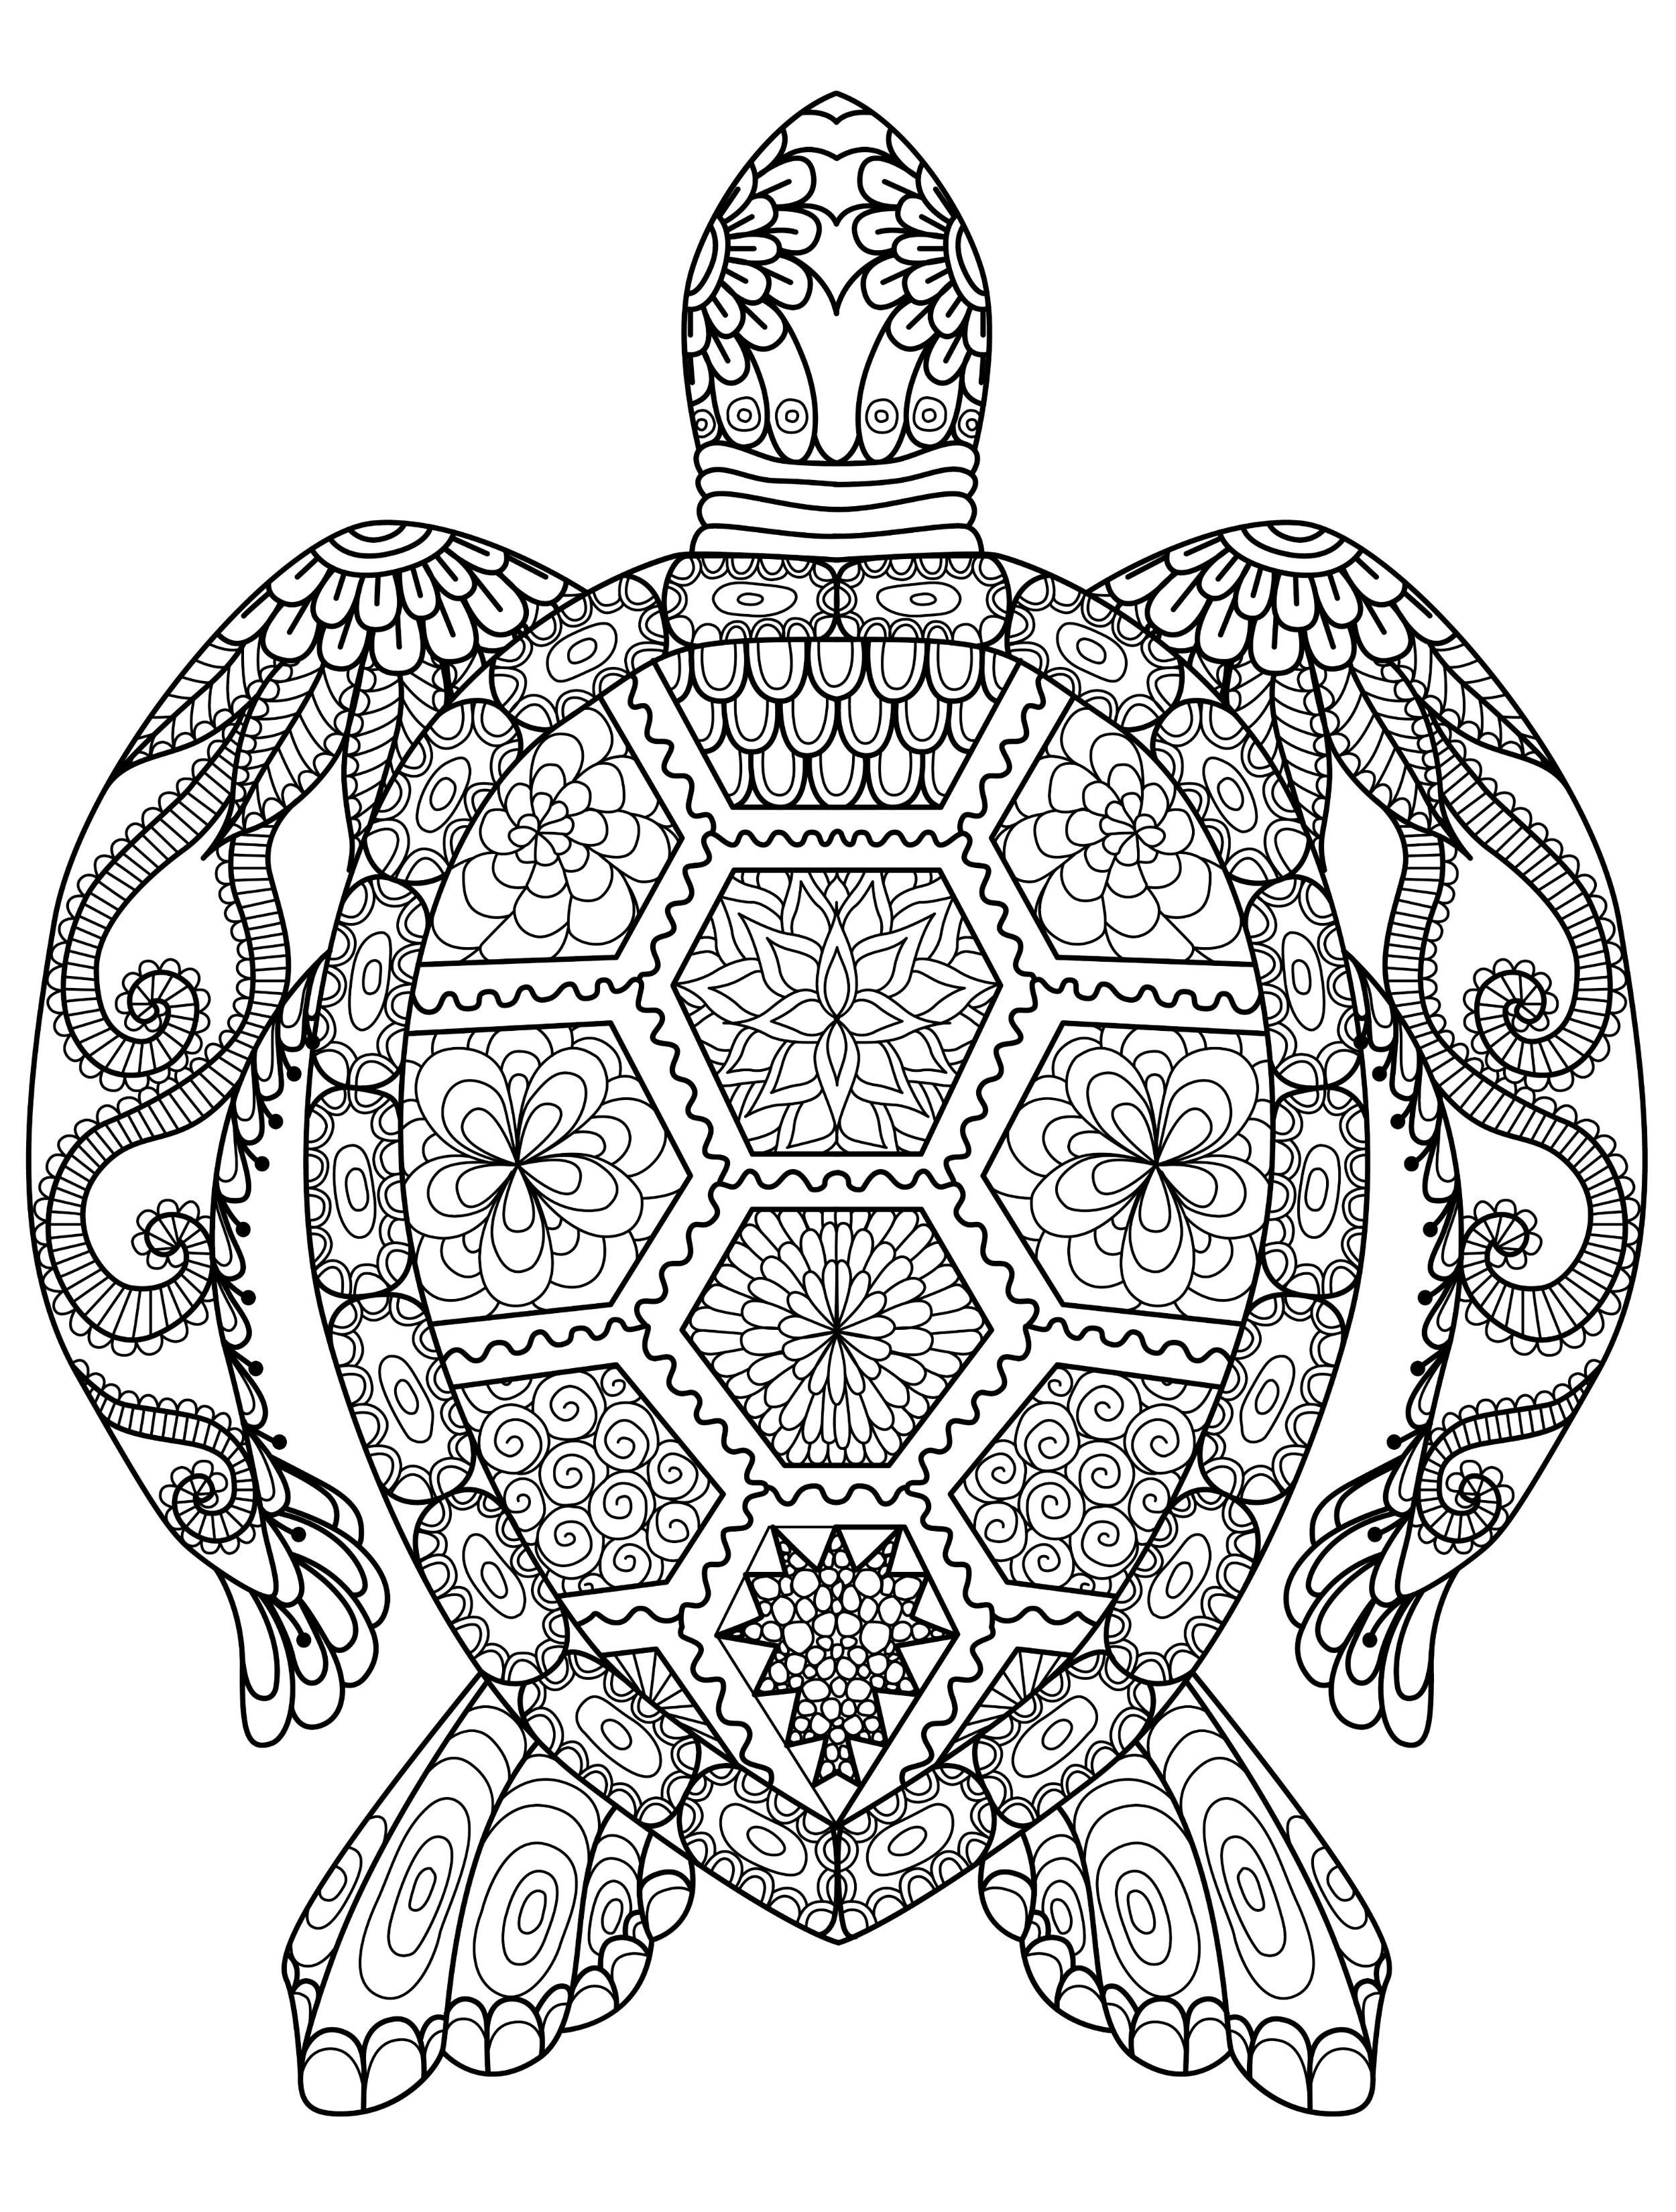 2500x3300 Geometric Animal Coloring Pages Wagashiya